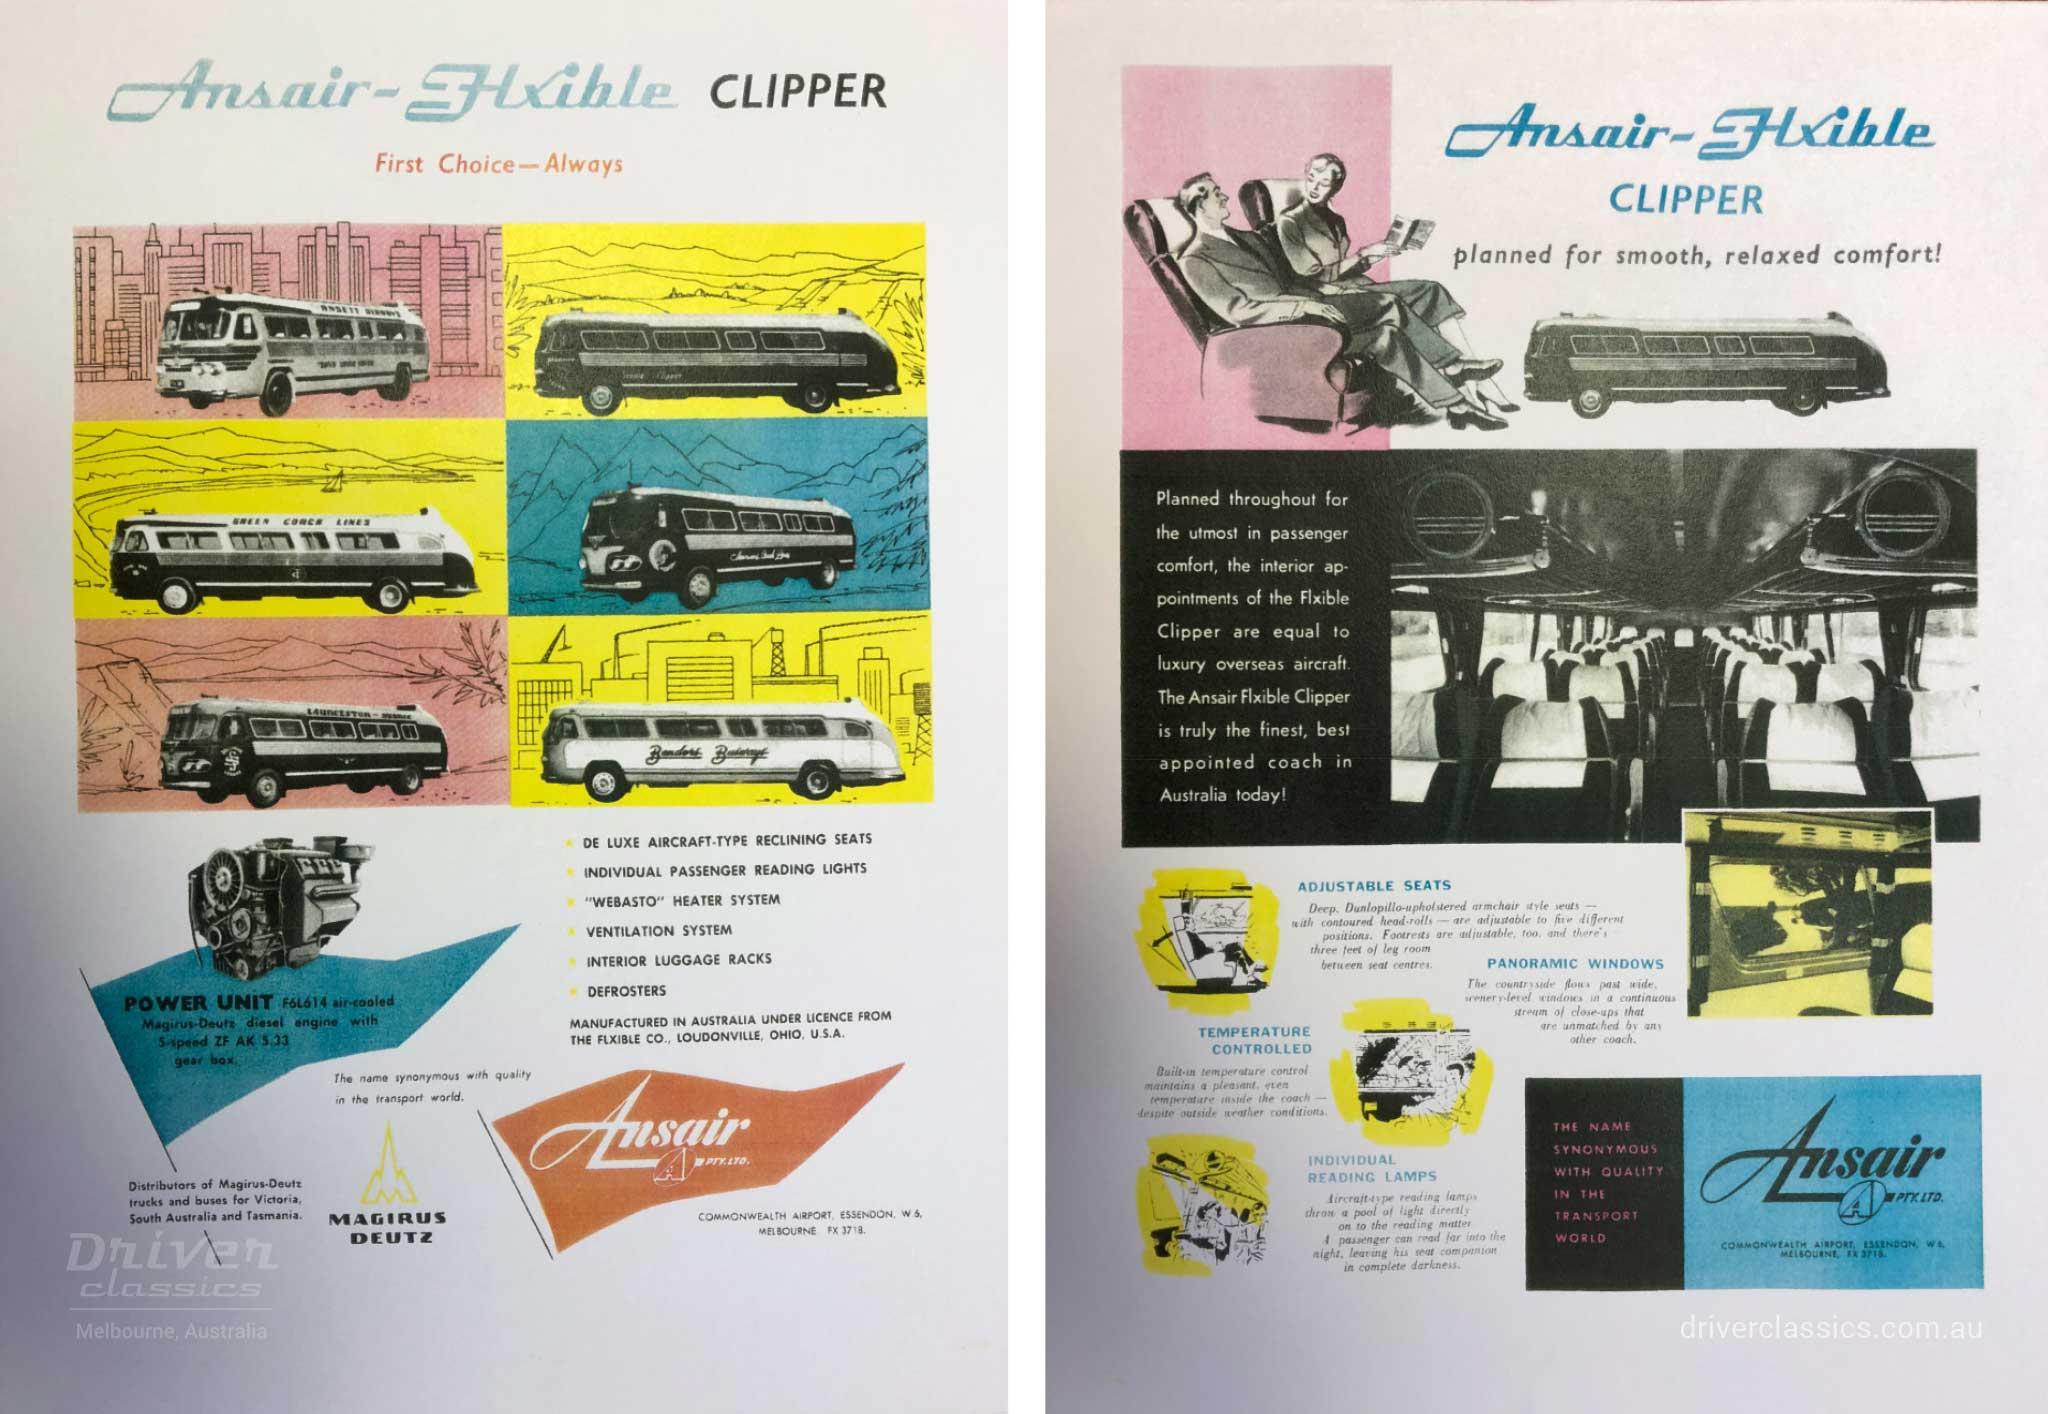 Ansair Flxible Clipper Advertisement, circa 1957.